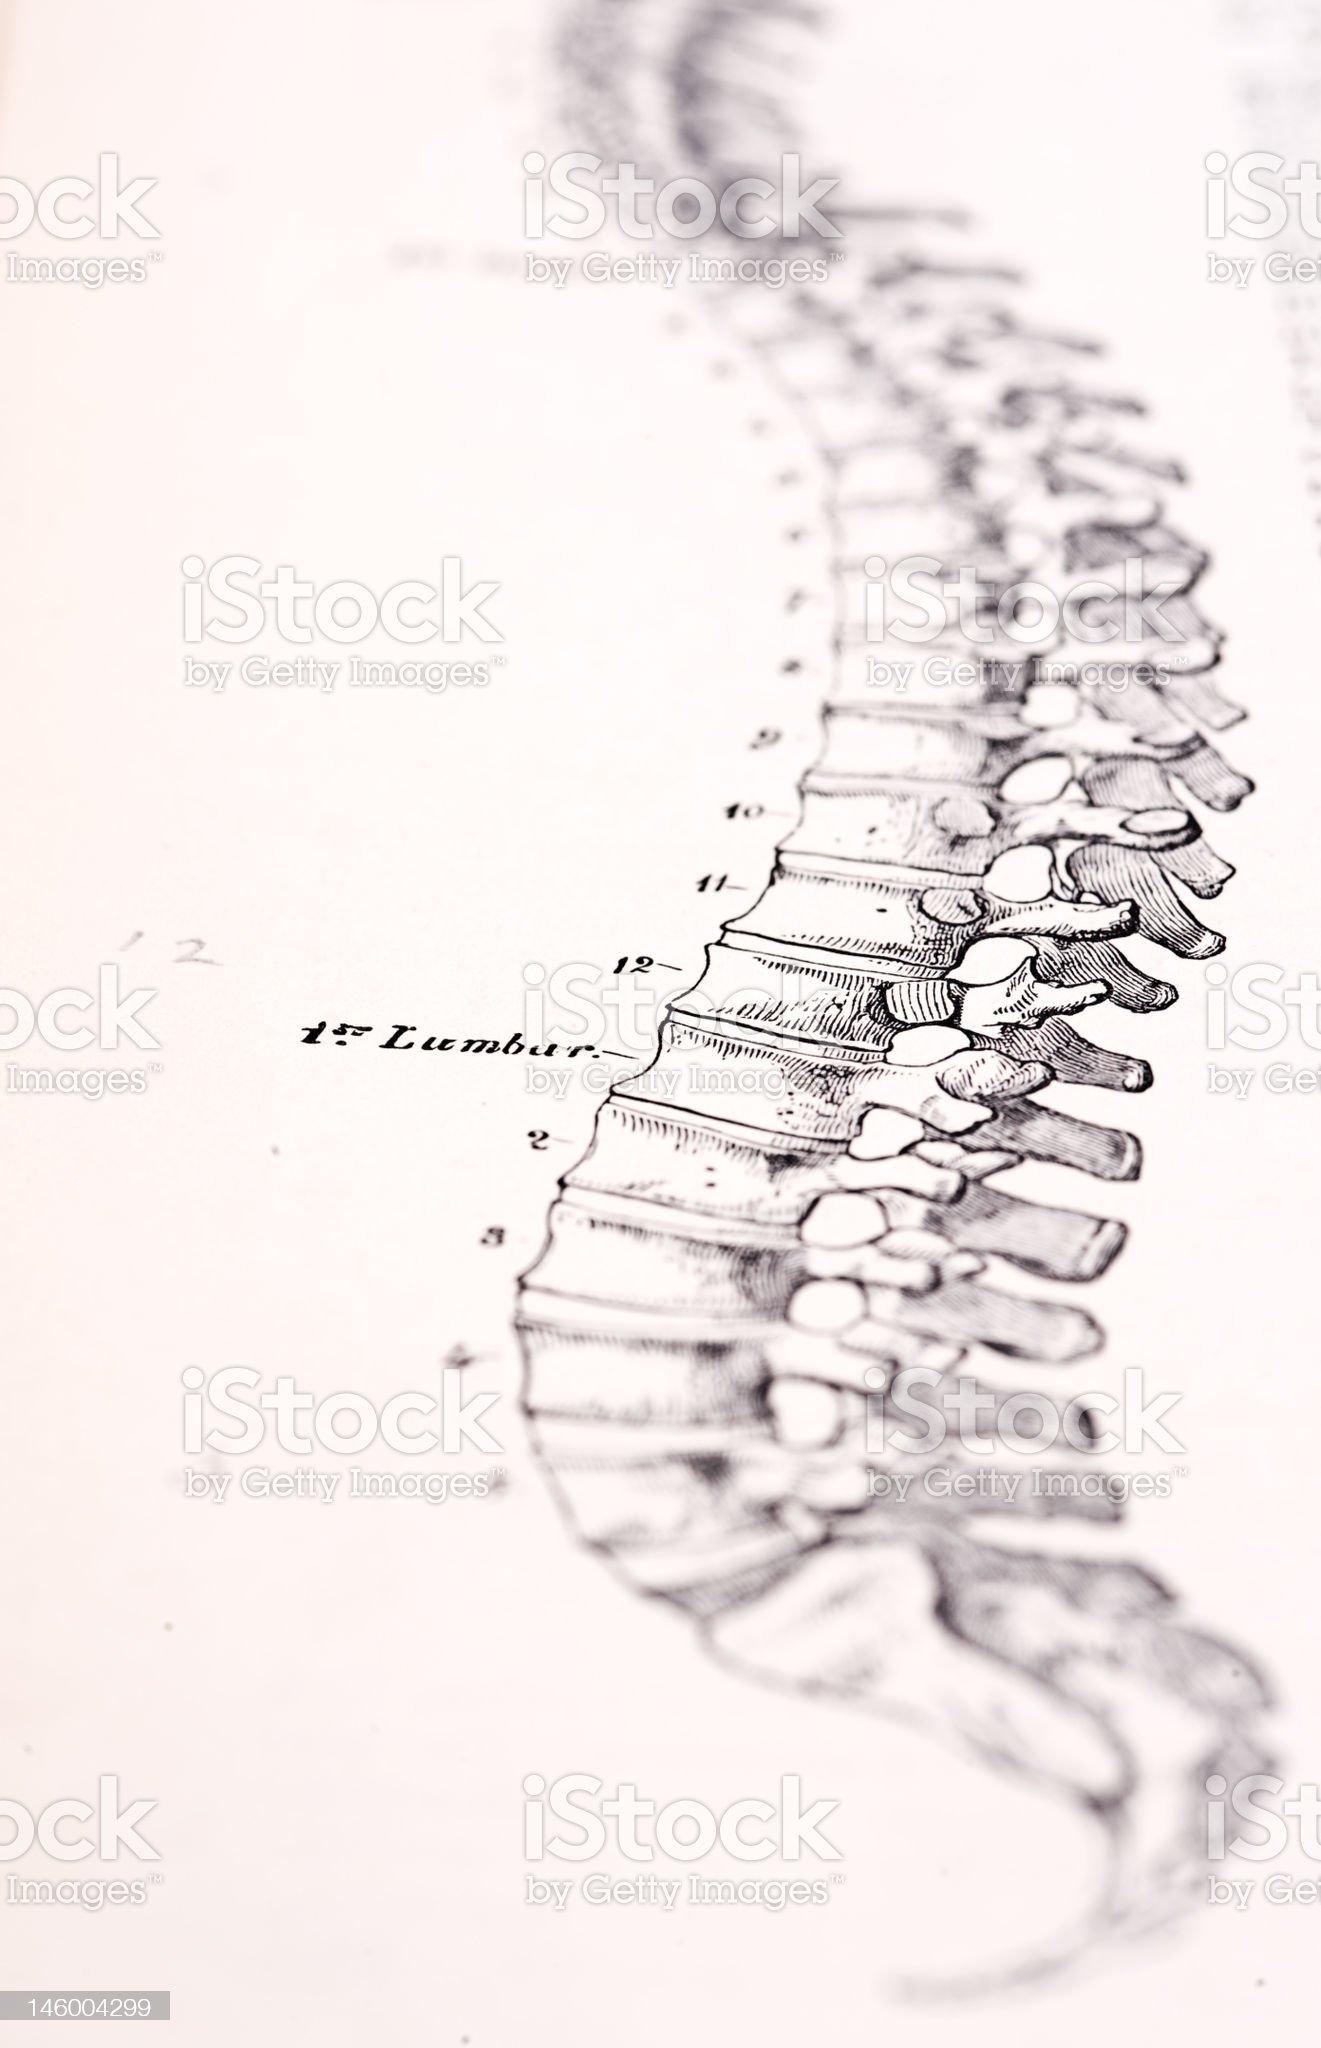 Antique Medical Illustration | Human Spine royalty-free stock photo